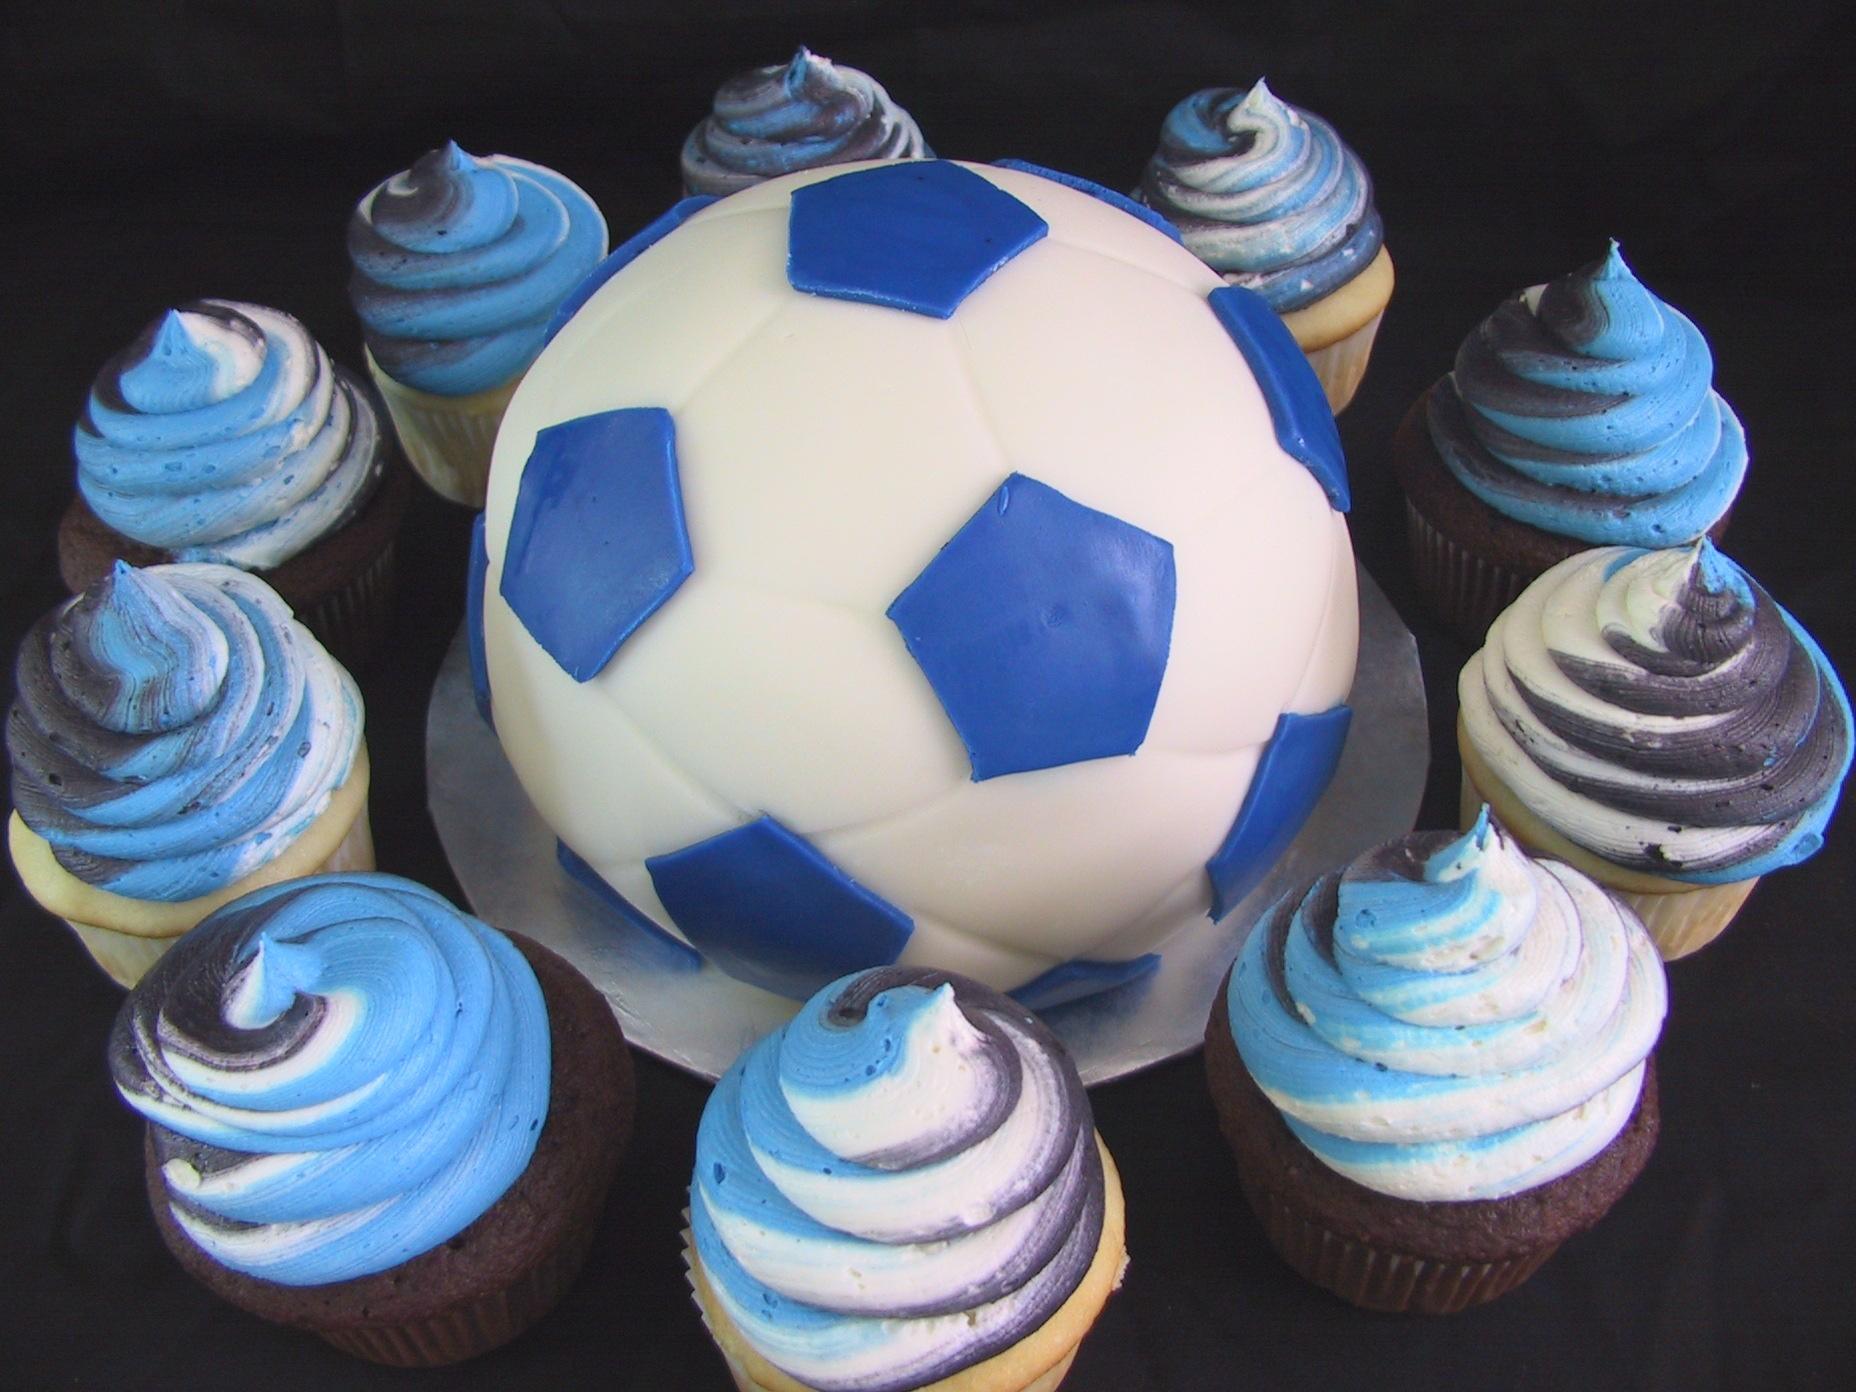 soccer ball danville lexington nicholasville frankfort louisville